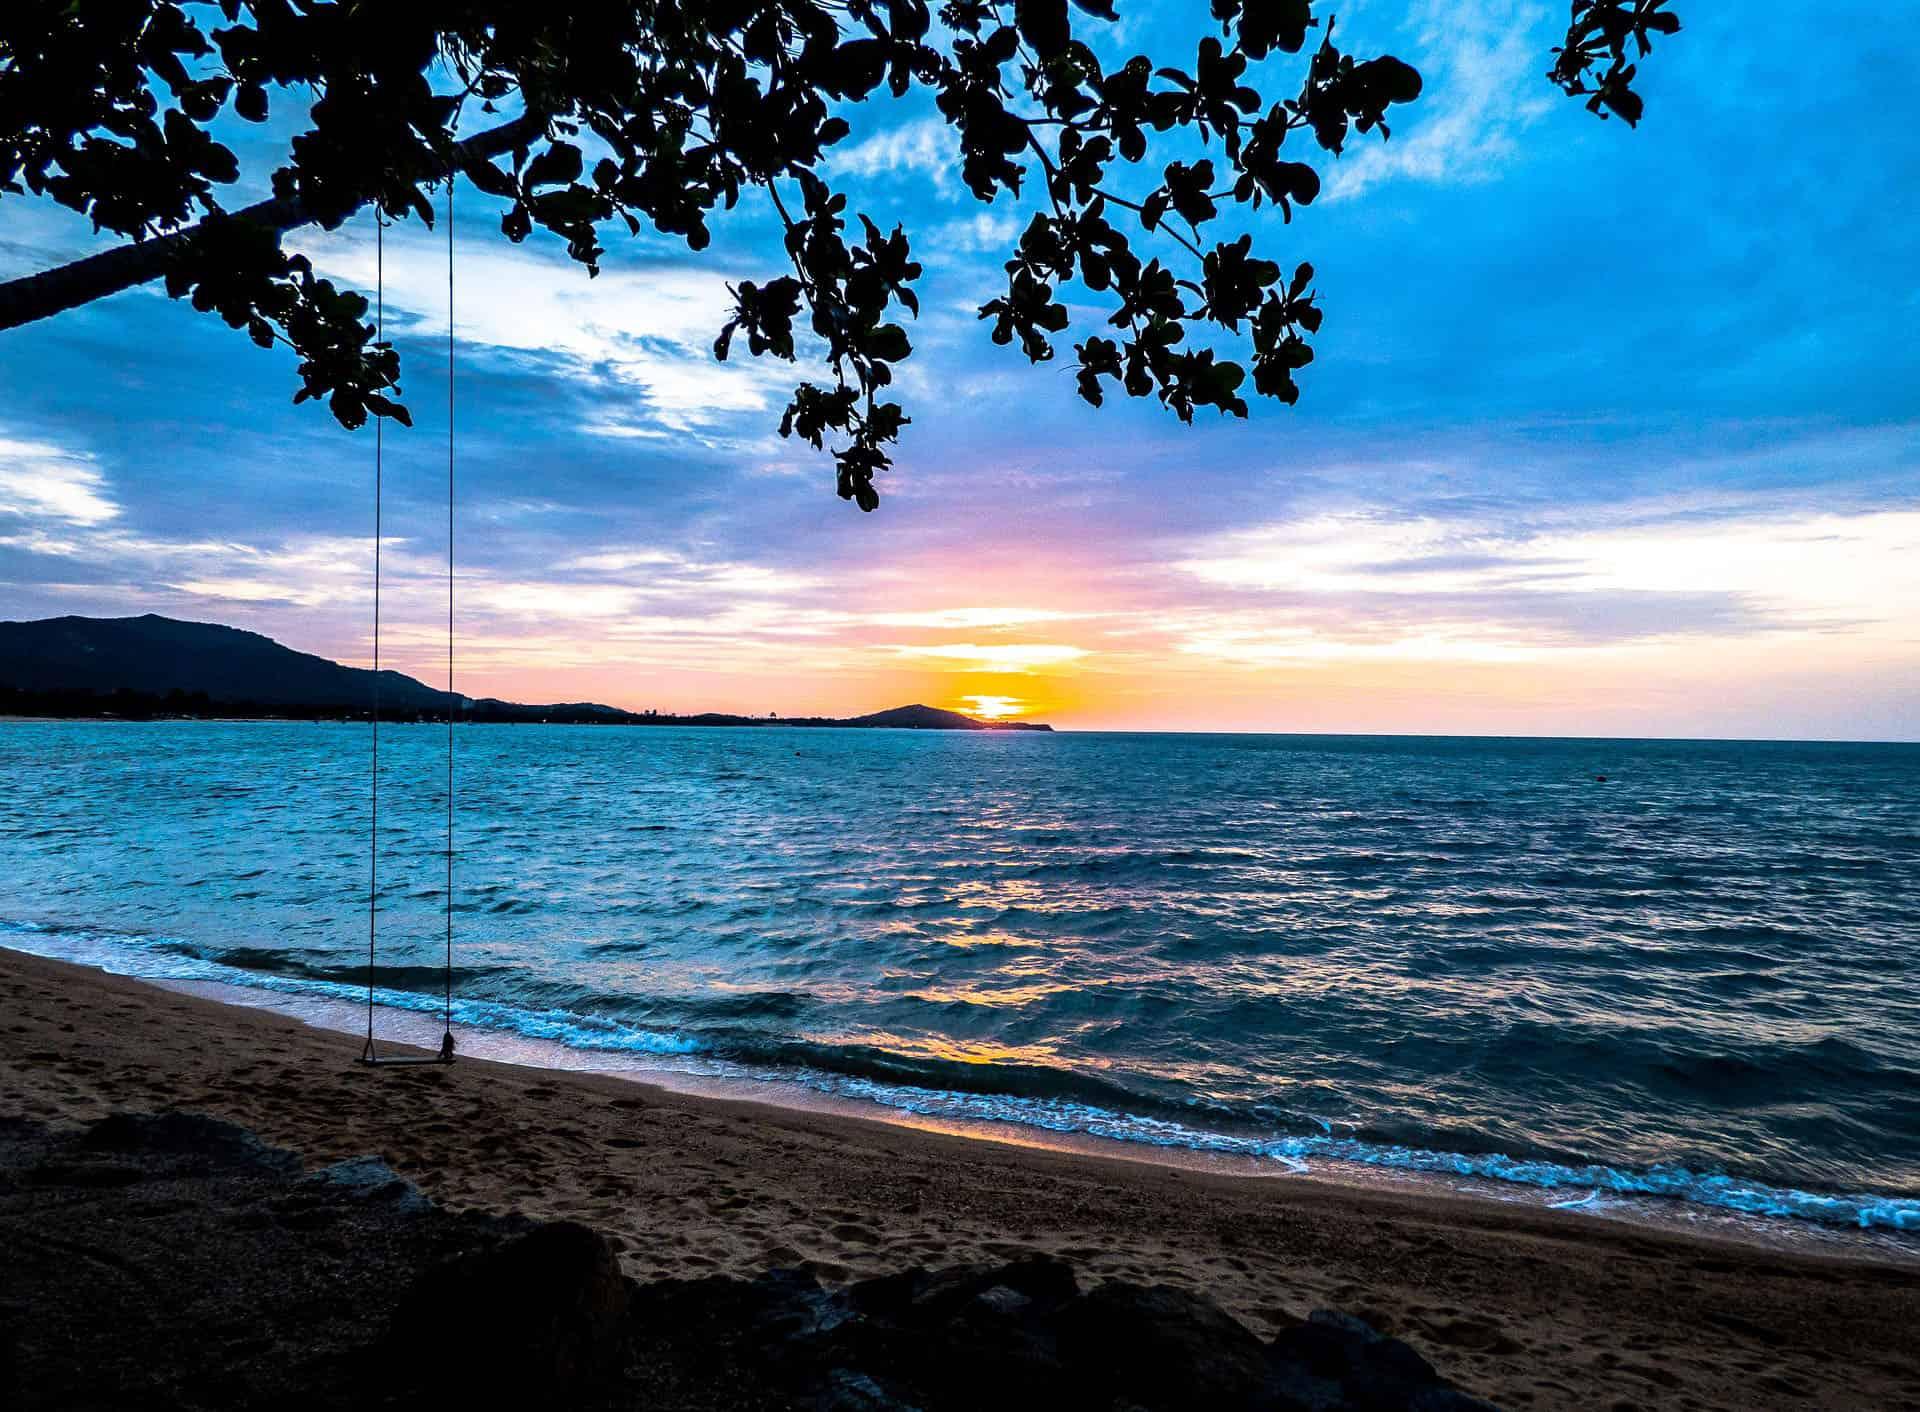 swing on thailand beach at sunset